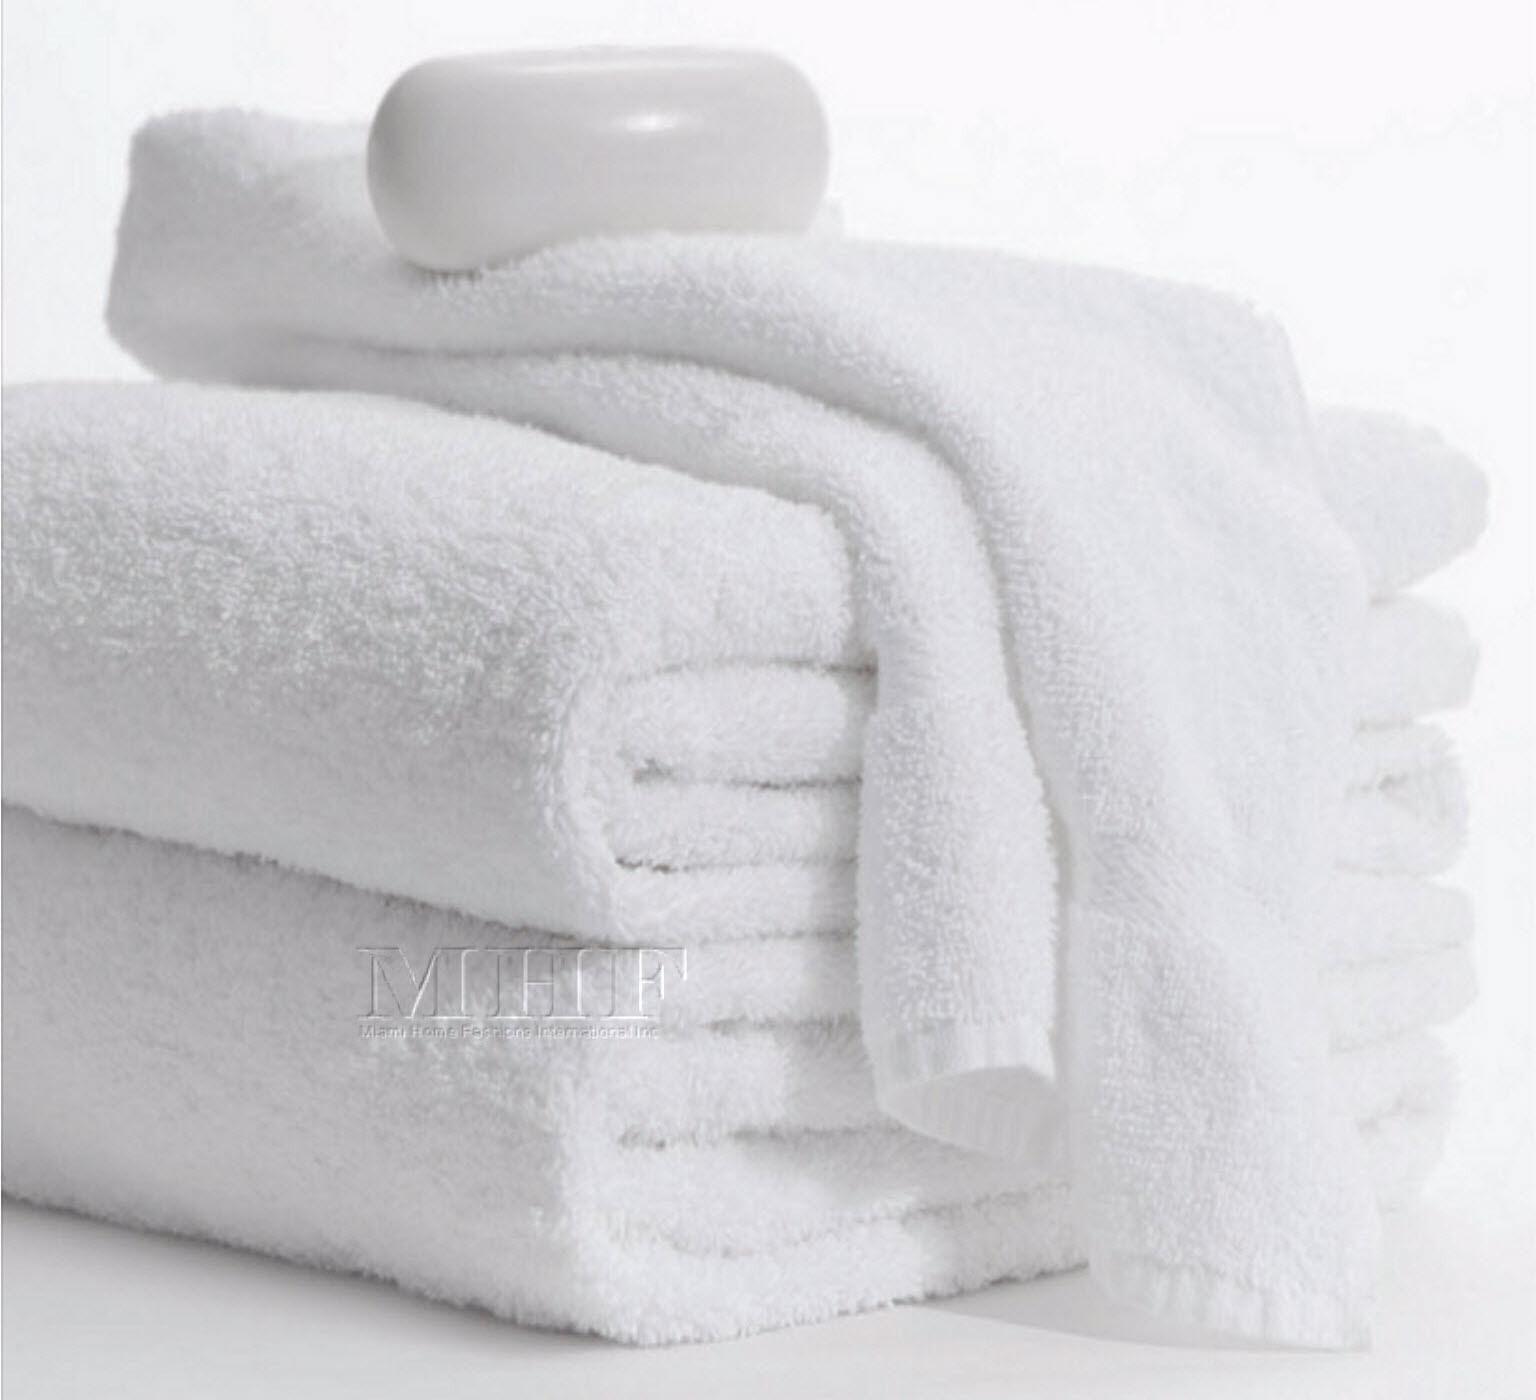 bath towels brand 24x48 inches white 8